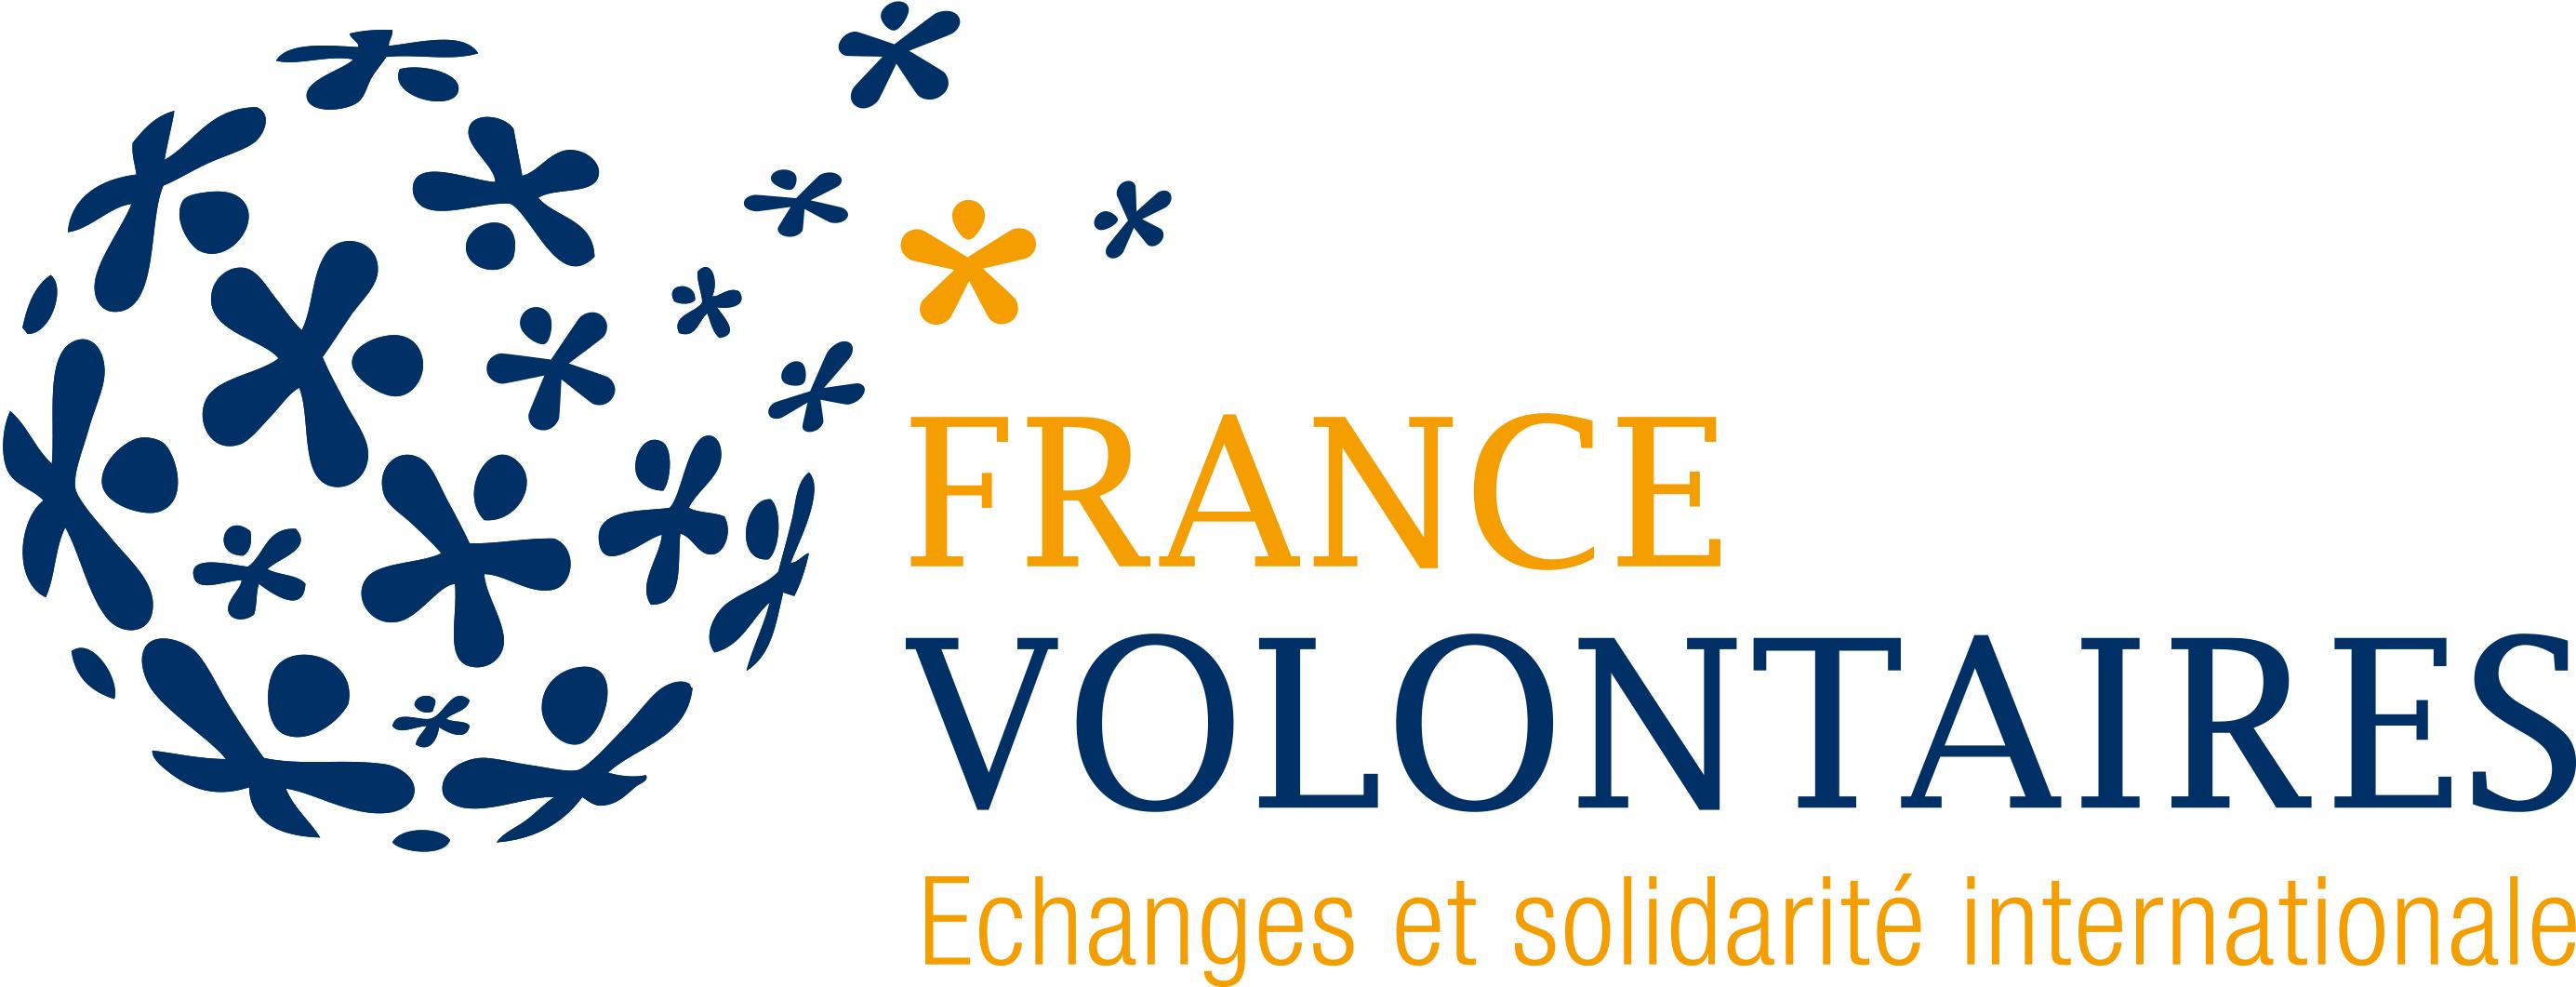 FranceVolontaires